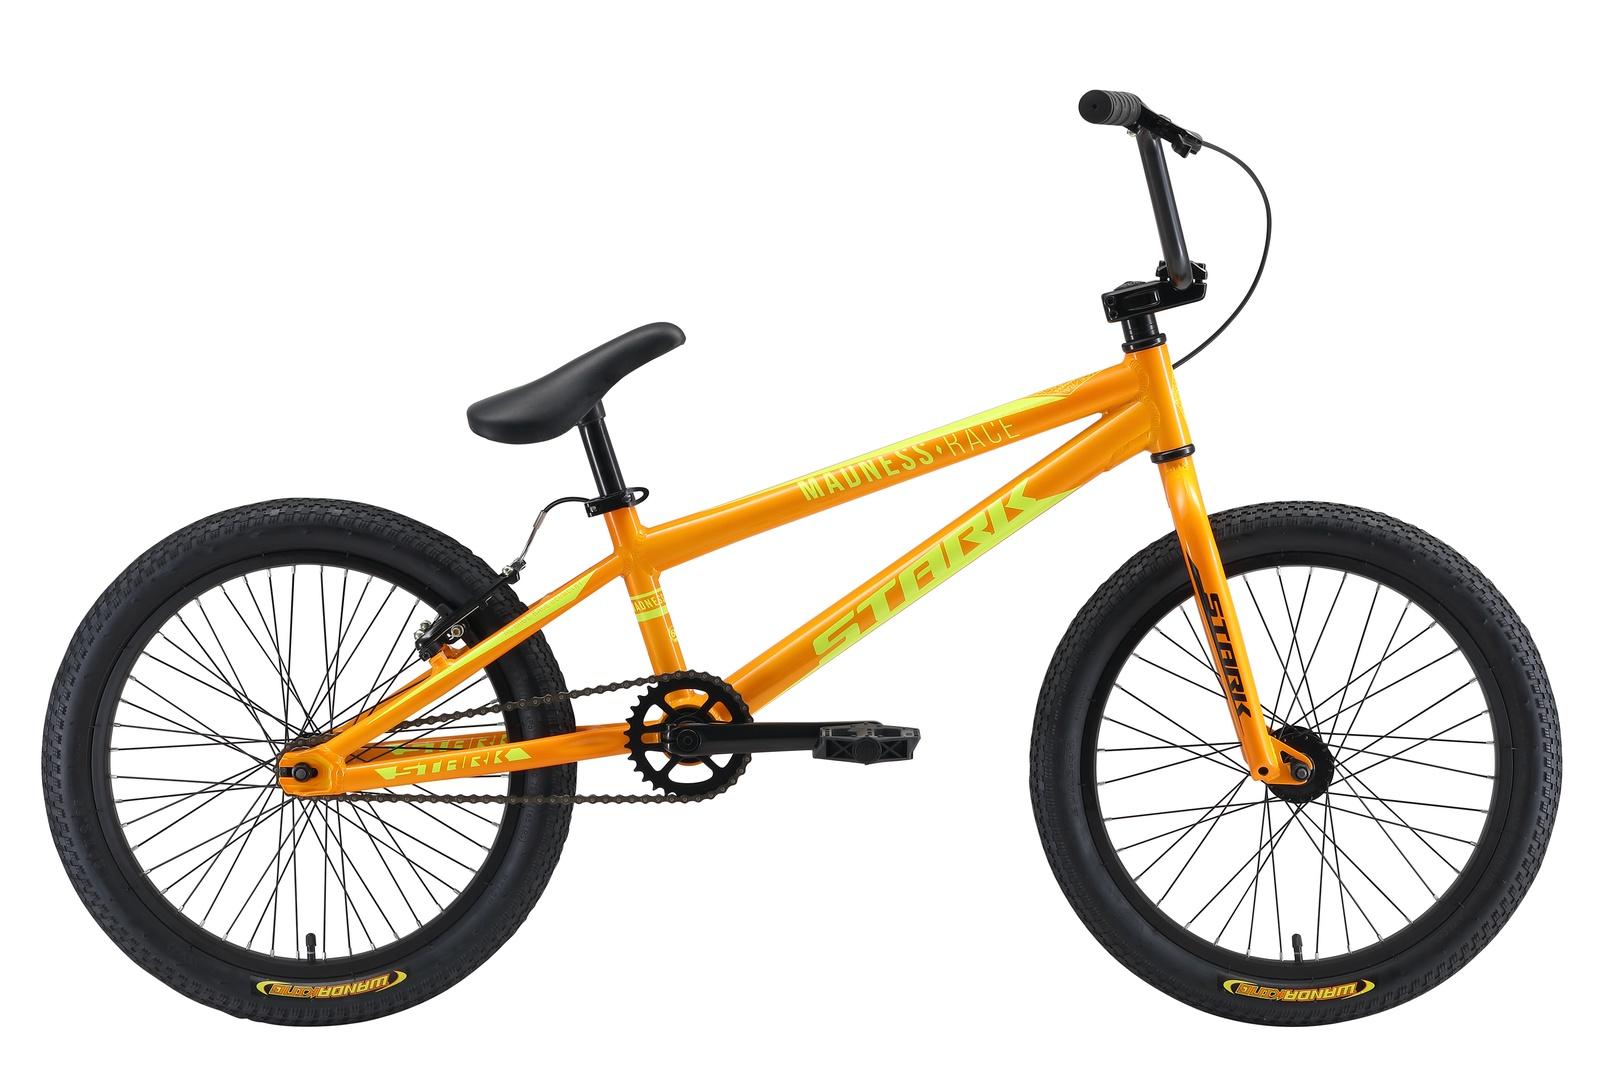 Велосипед Madness BMX Race 20 2019, оранжевый, желтый цена